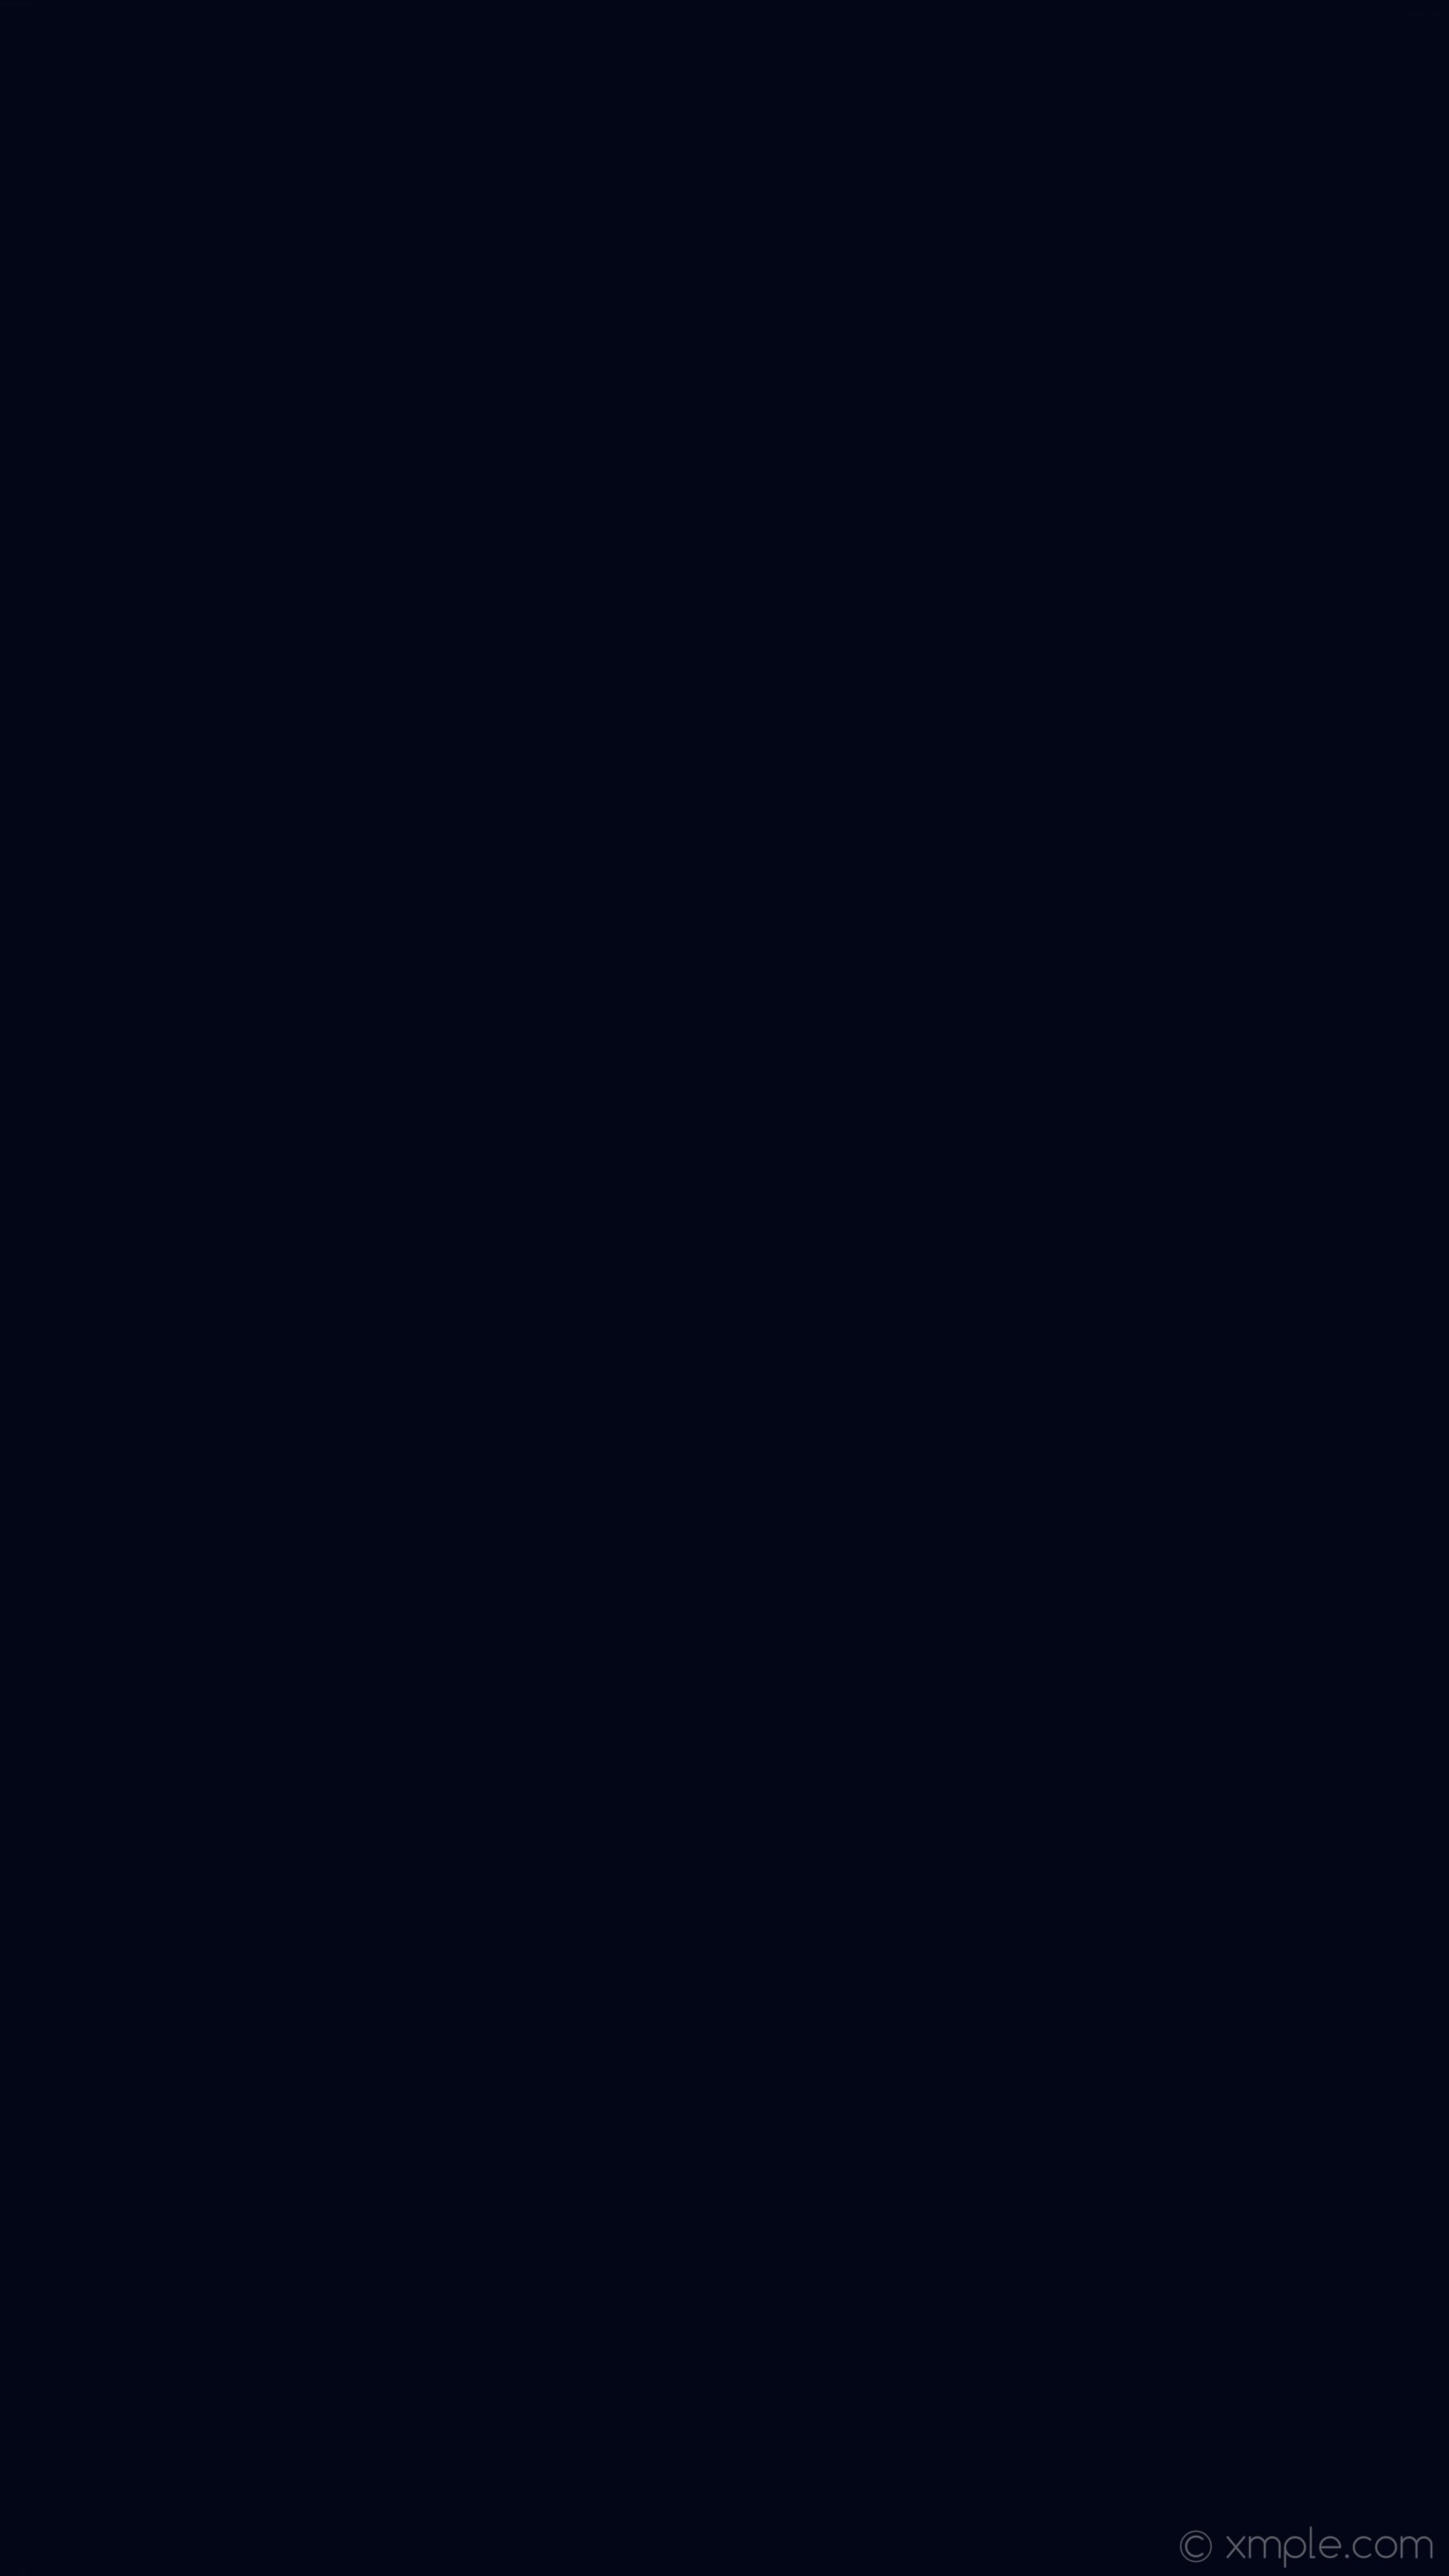 3840×2160 · 2160×3840